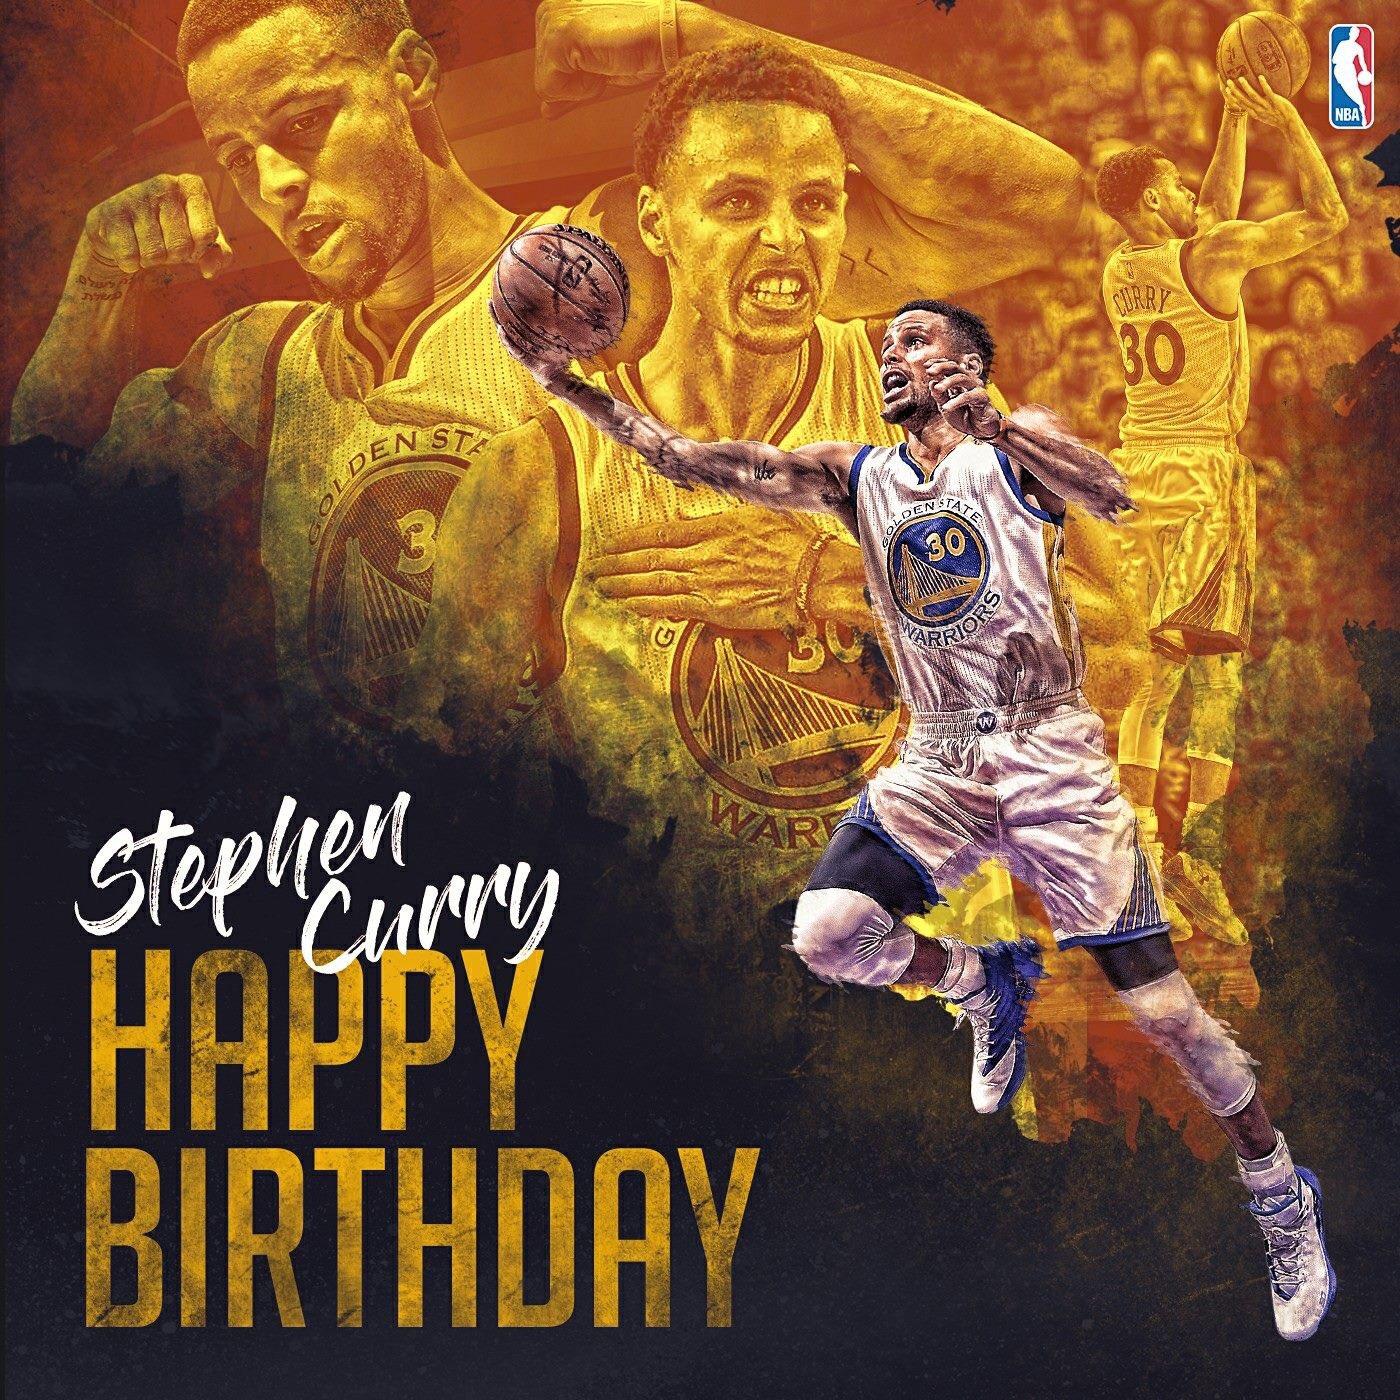 Happy birthday Stephen Curry